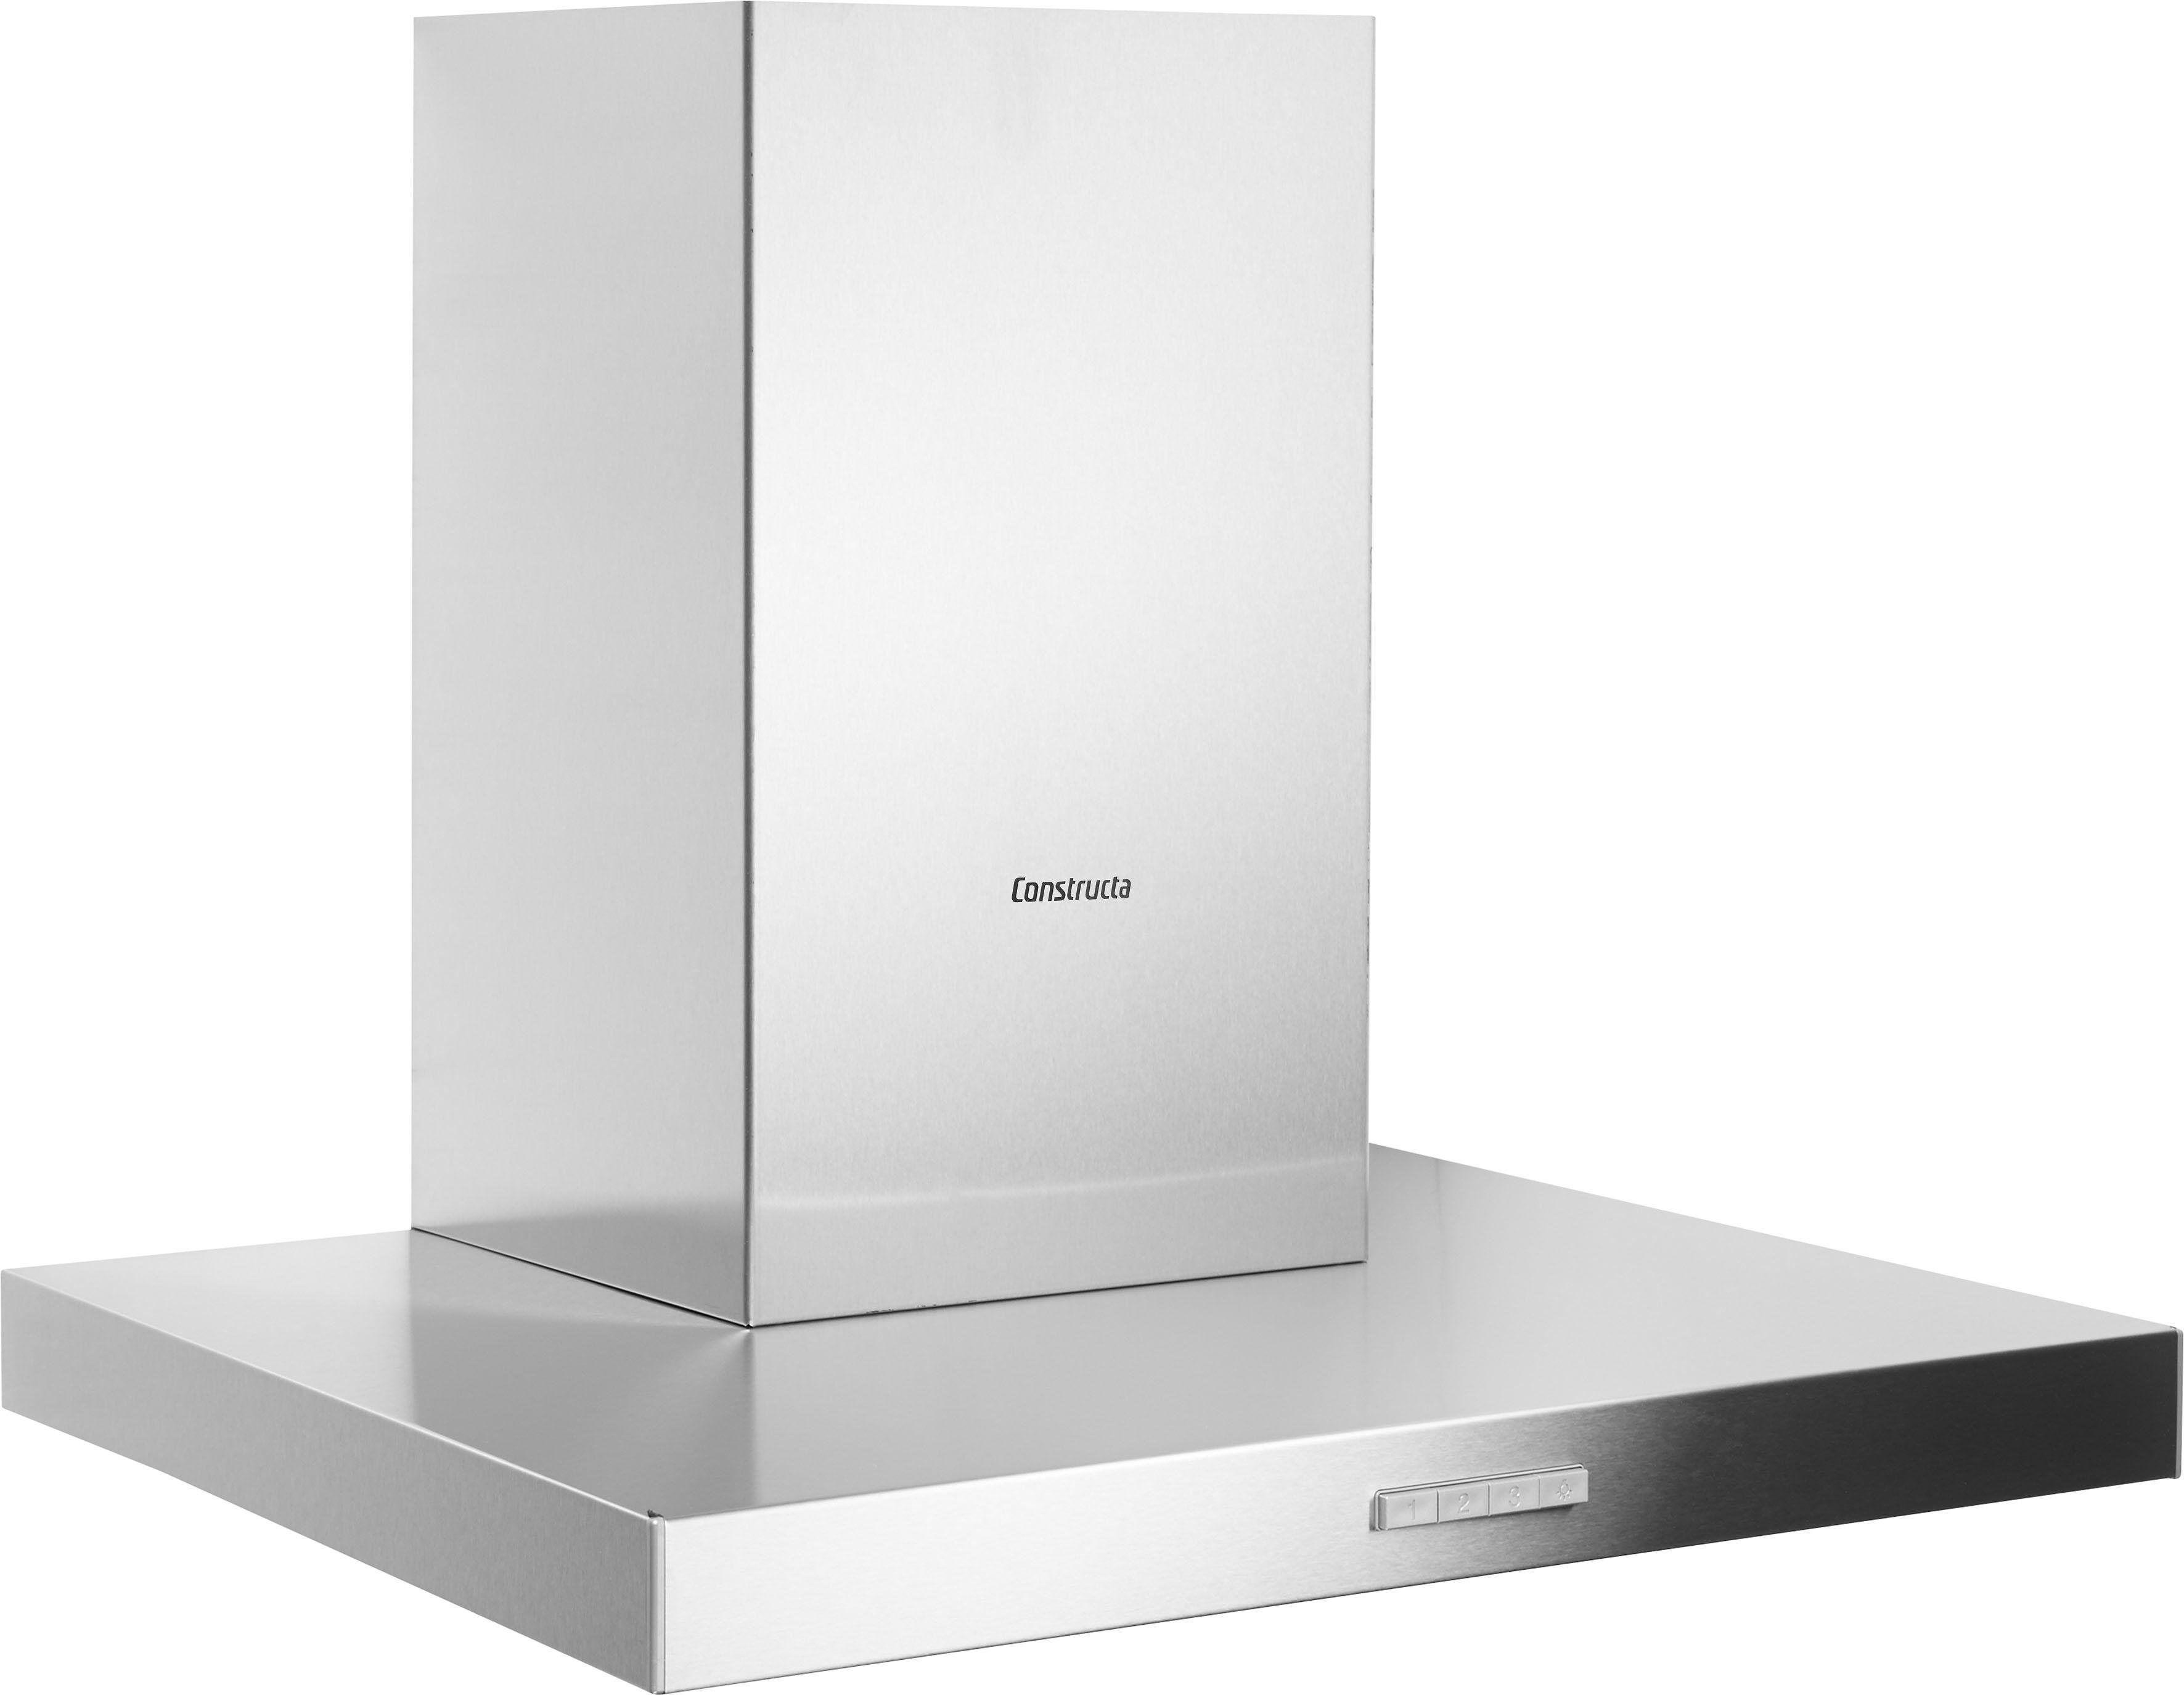 Constructa Wandhaube CD636650, Energieeffizienzklasse D